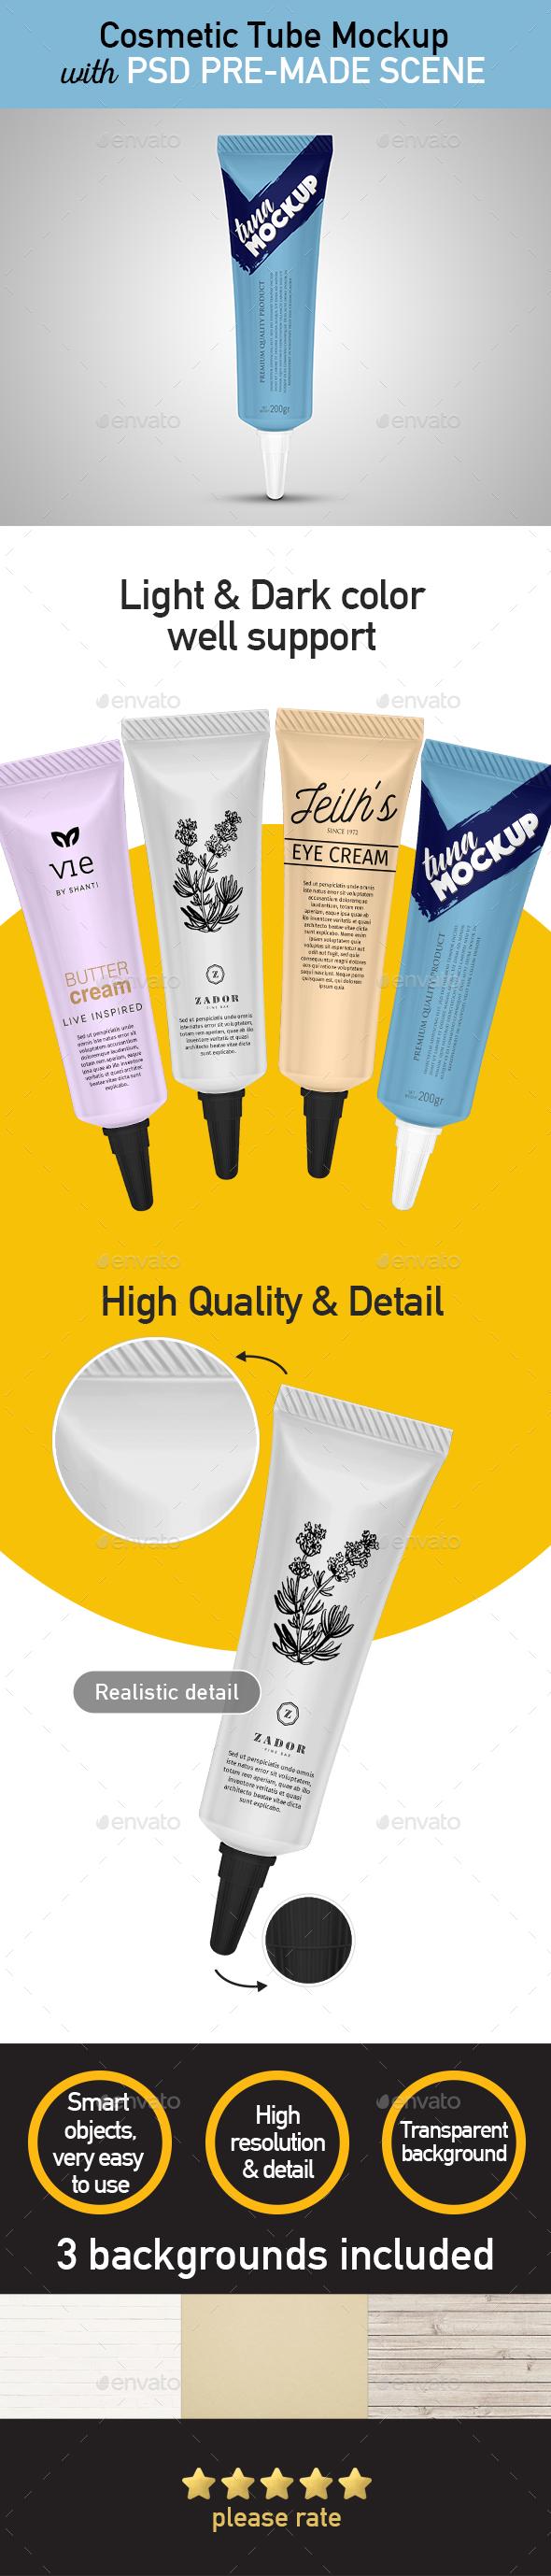 Cosmetic Tube Mockup. - Product Mock-Ups Graphics